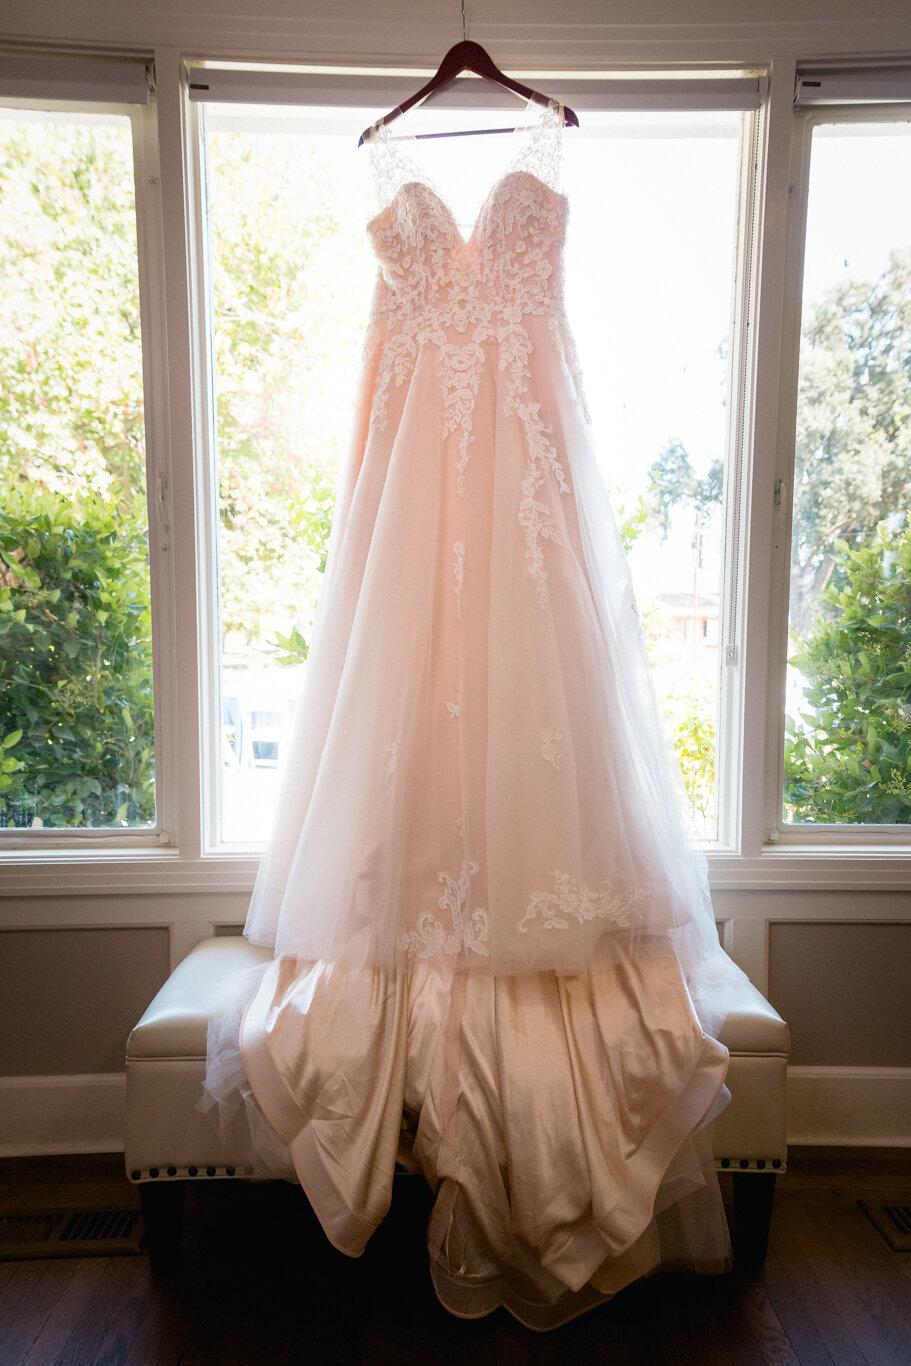 2019.08.24_Emily-Ashir-Wedding-at-the-Maples-4897.jpg